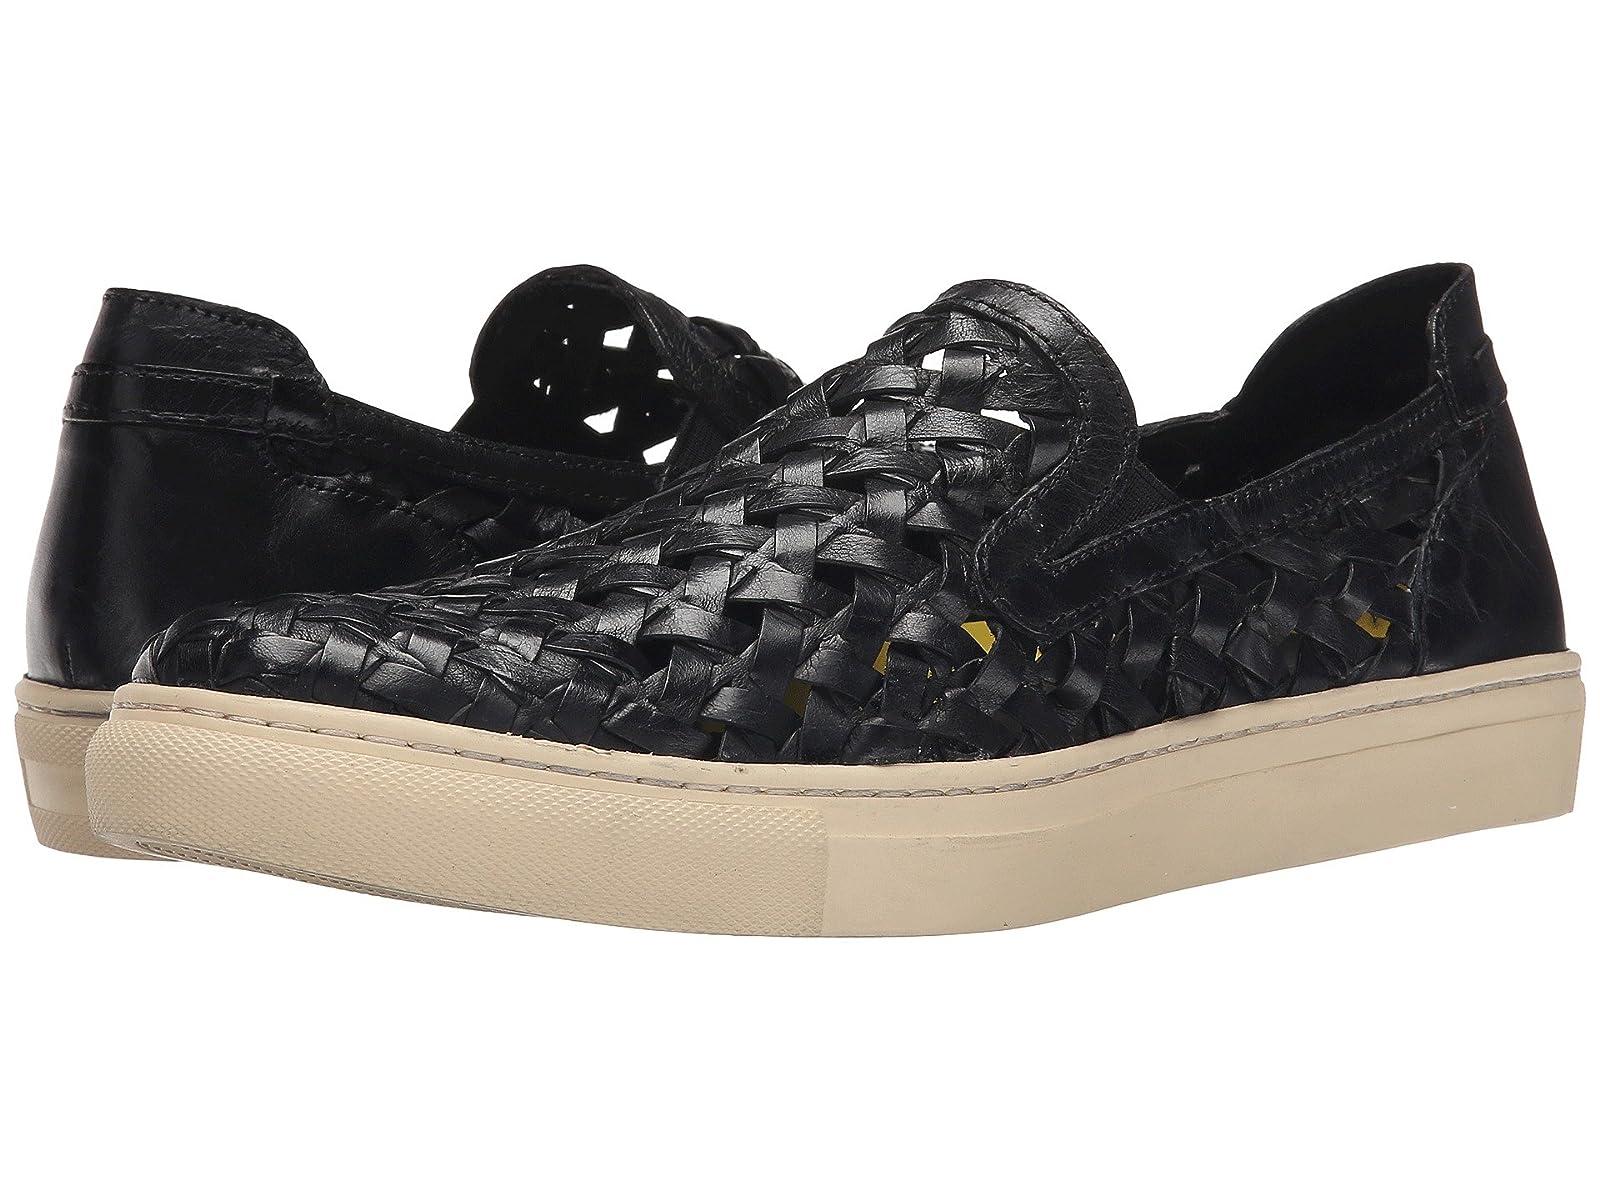 Donald J Pliner KarterCheap and distinctive eye-catching shoes